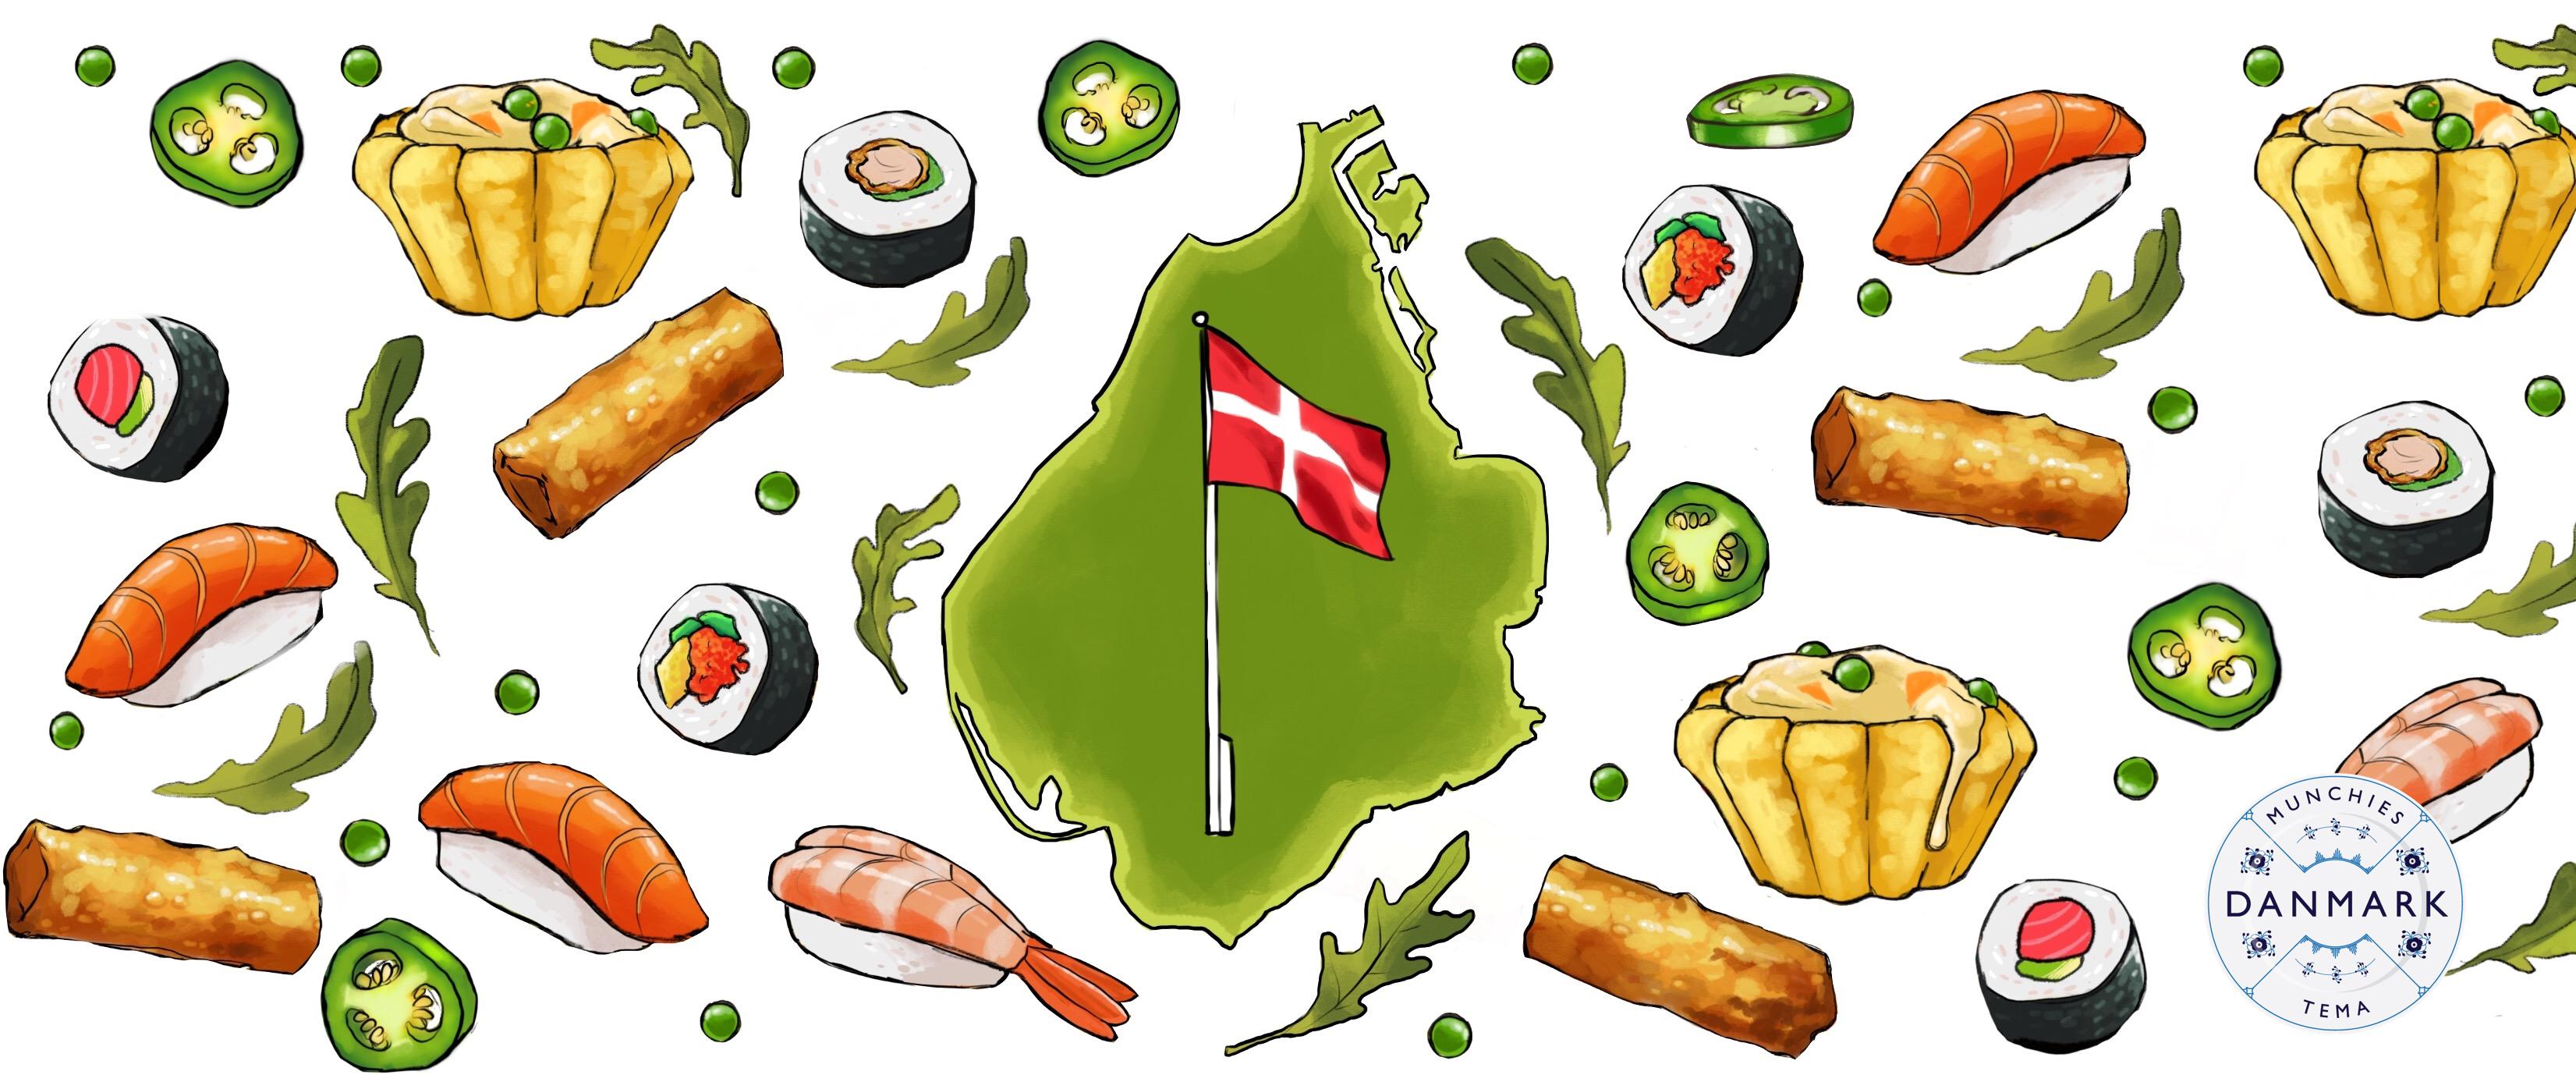 Copenhagen Is the World Capital of Weird Frankenfoods.